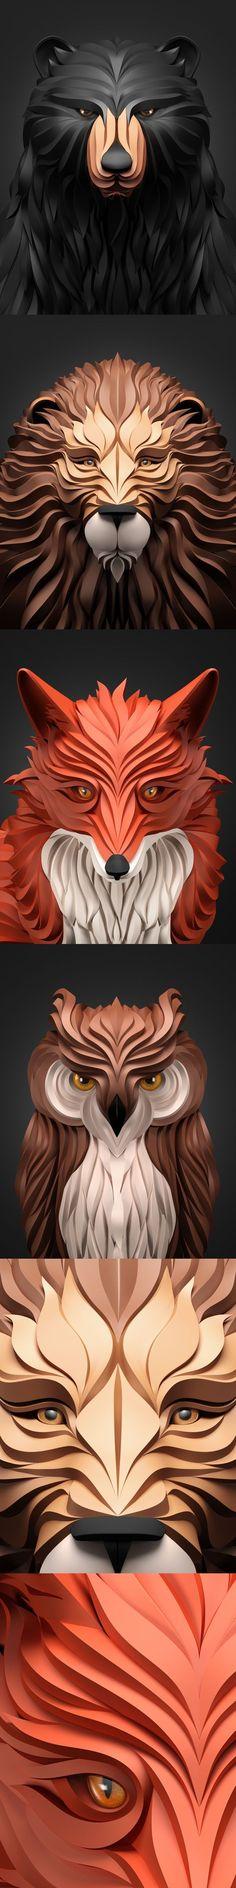 Mask Rider Predator Sculpt D Digital Art Pinterest Predator - Fascinating 3d renderings of people and animals by maxim shkret